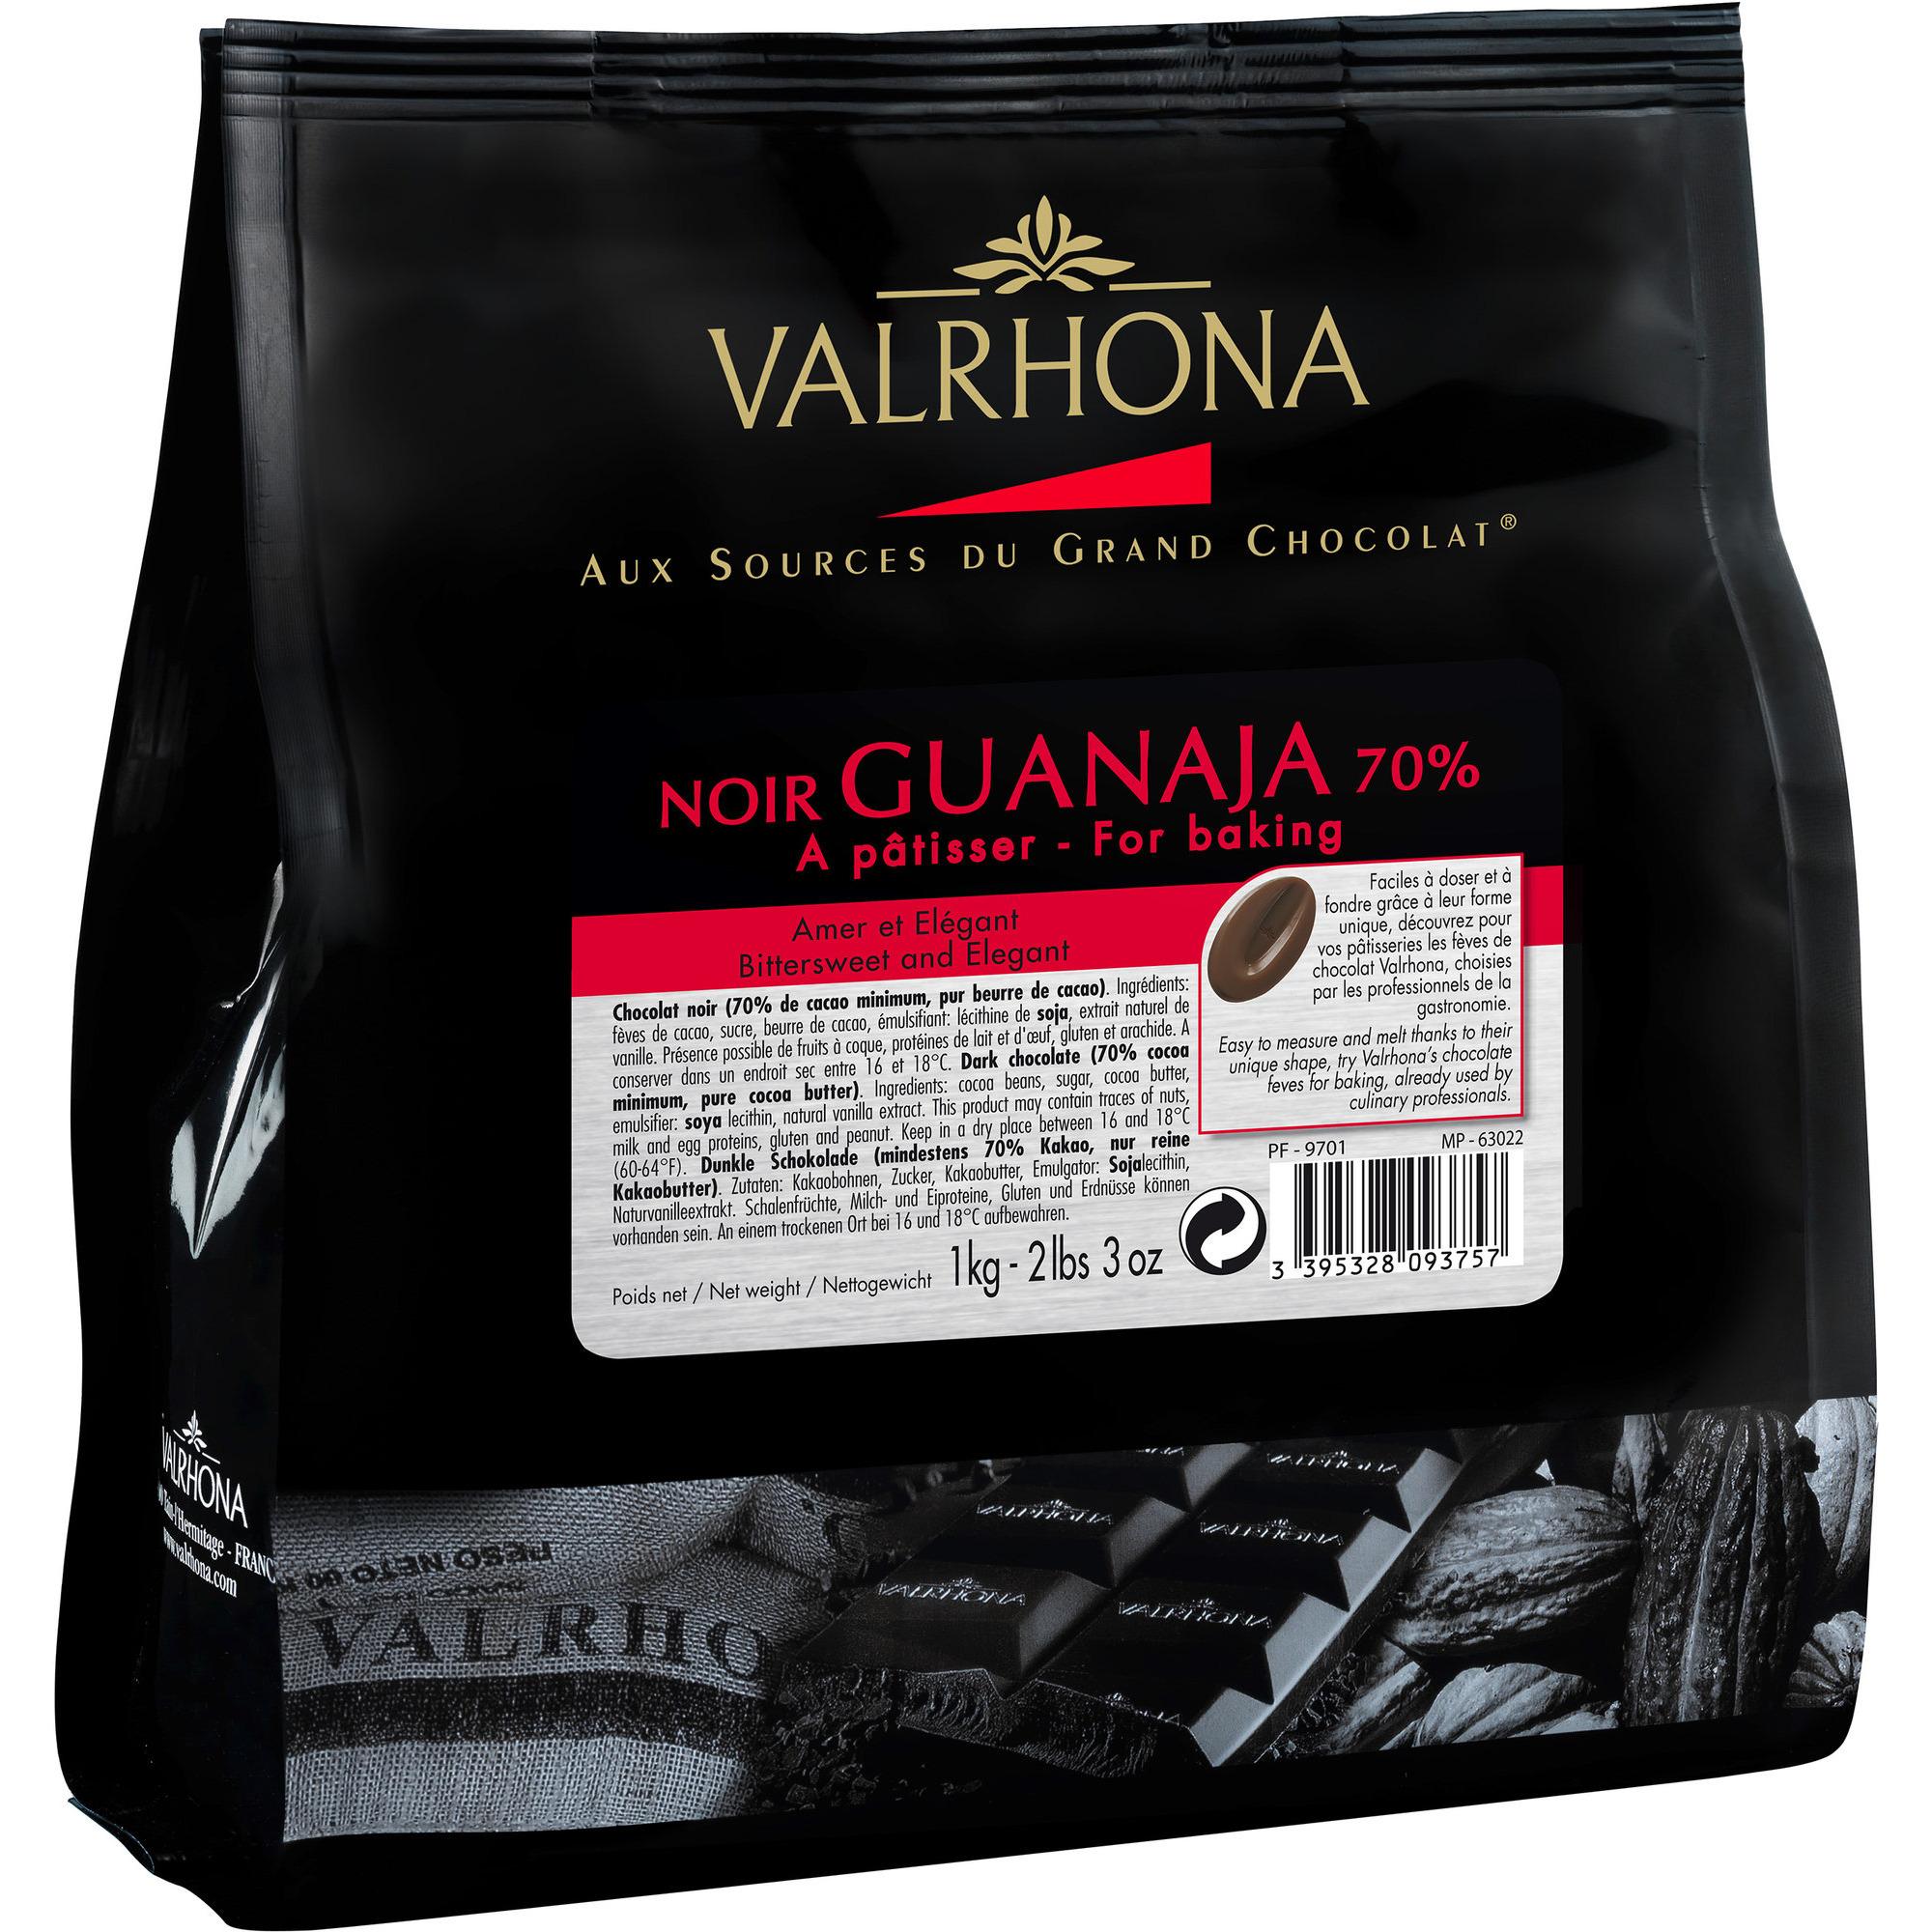 Valrhona Guanaja 70 % 1 kg pose